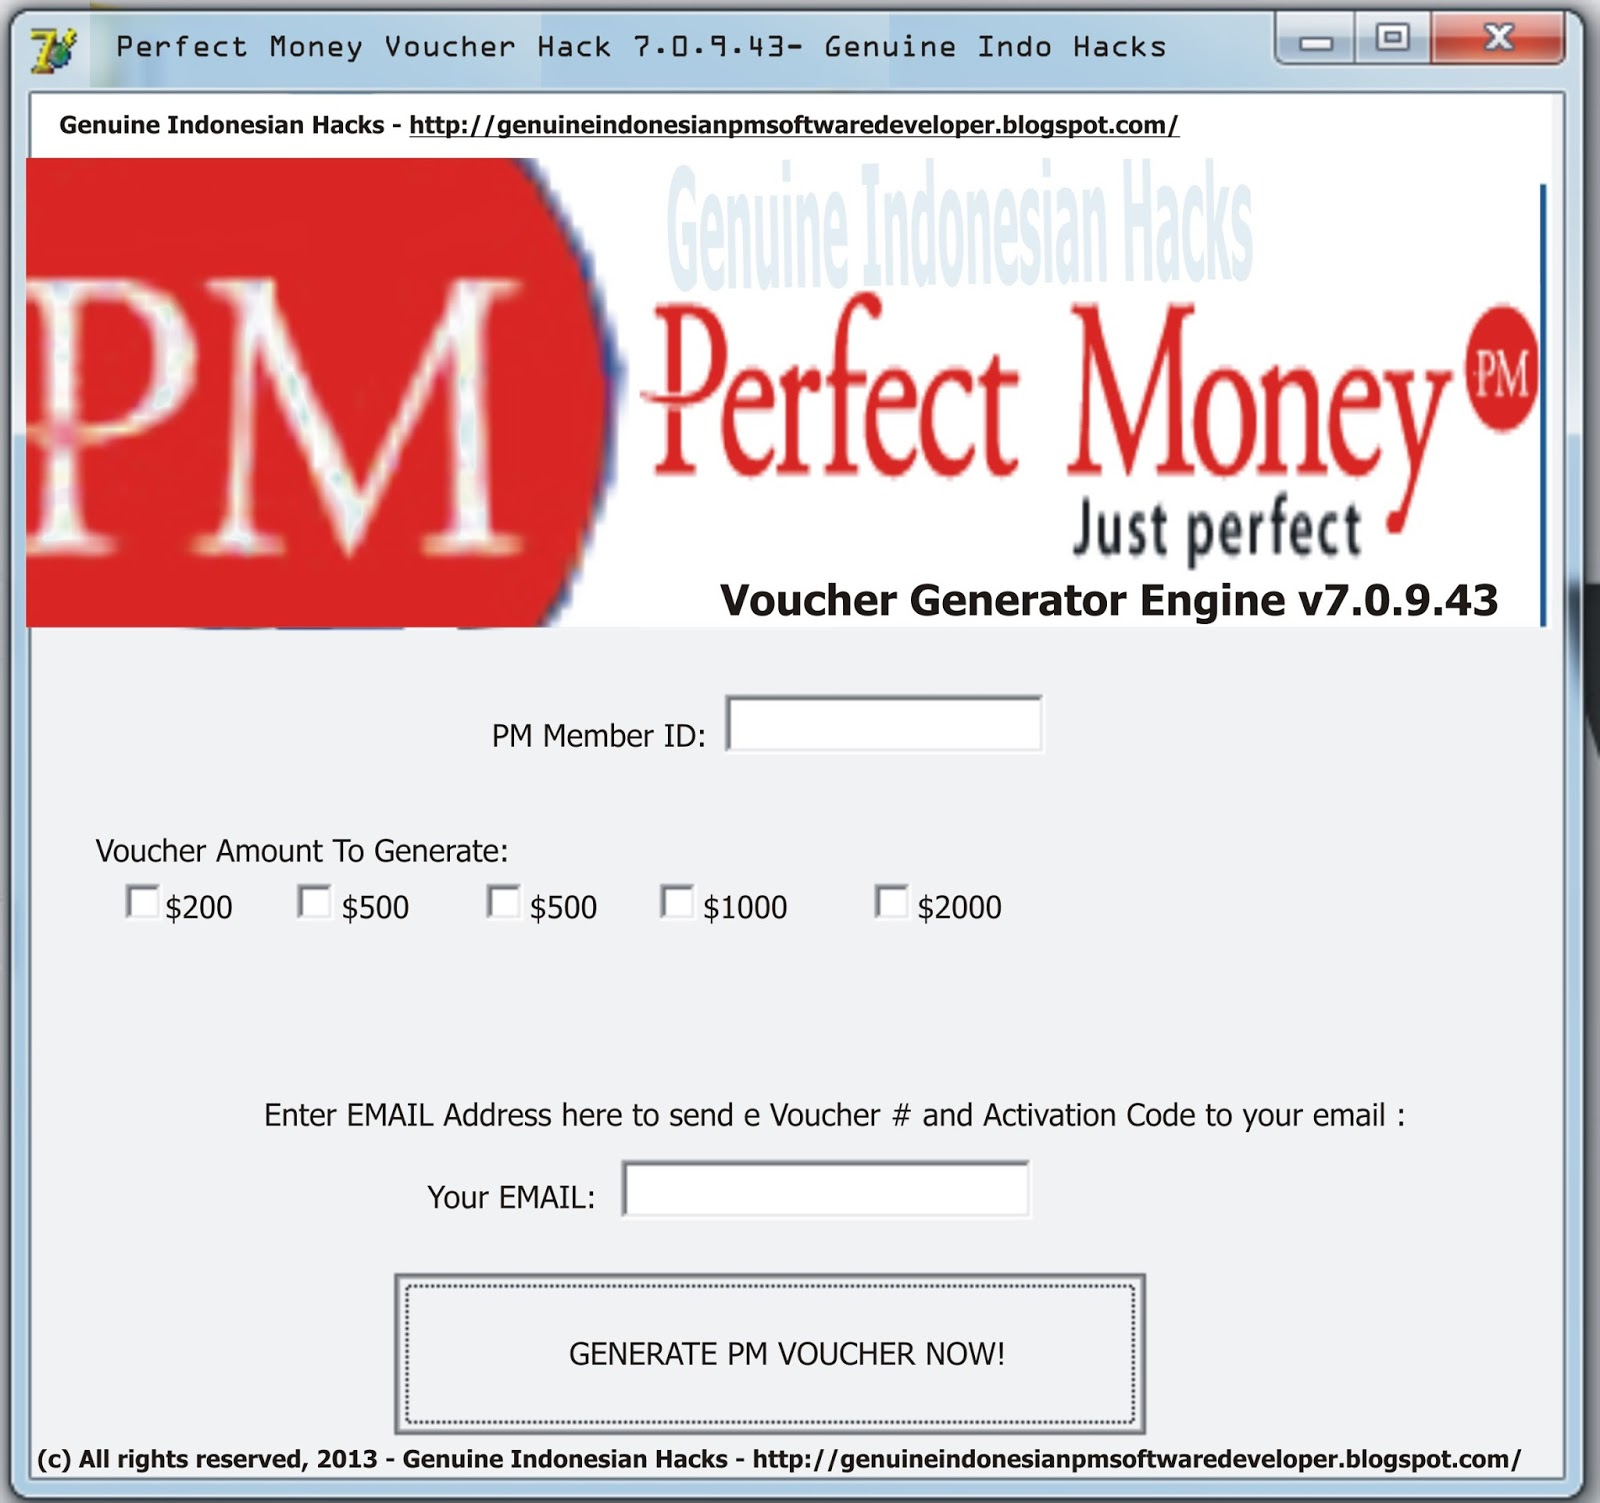 Perfect money voucher hack